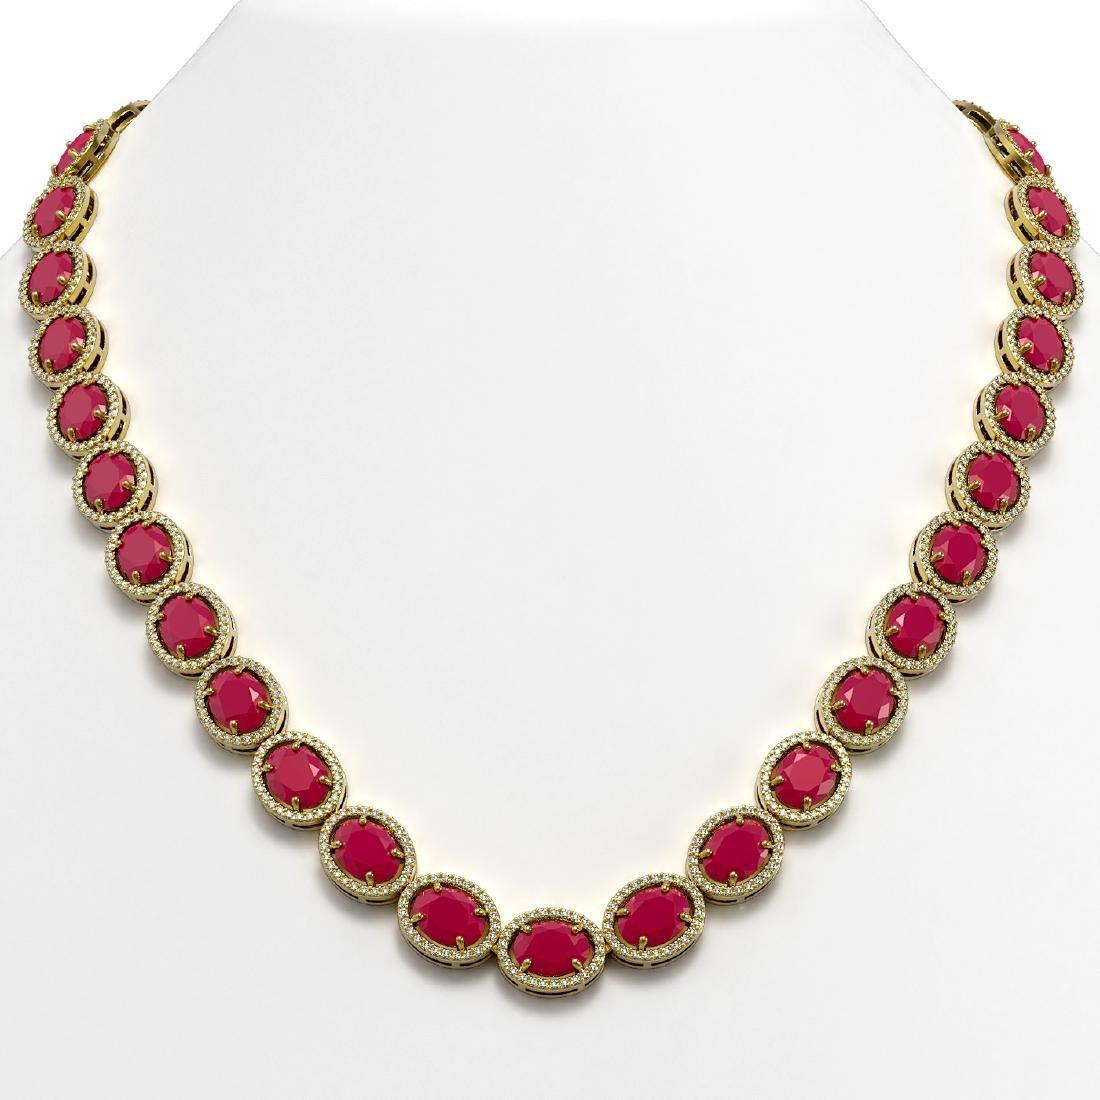 71.87 CTW Ruby & Diamond Halo Necklace 10K Yellow Gold